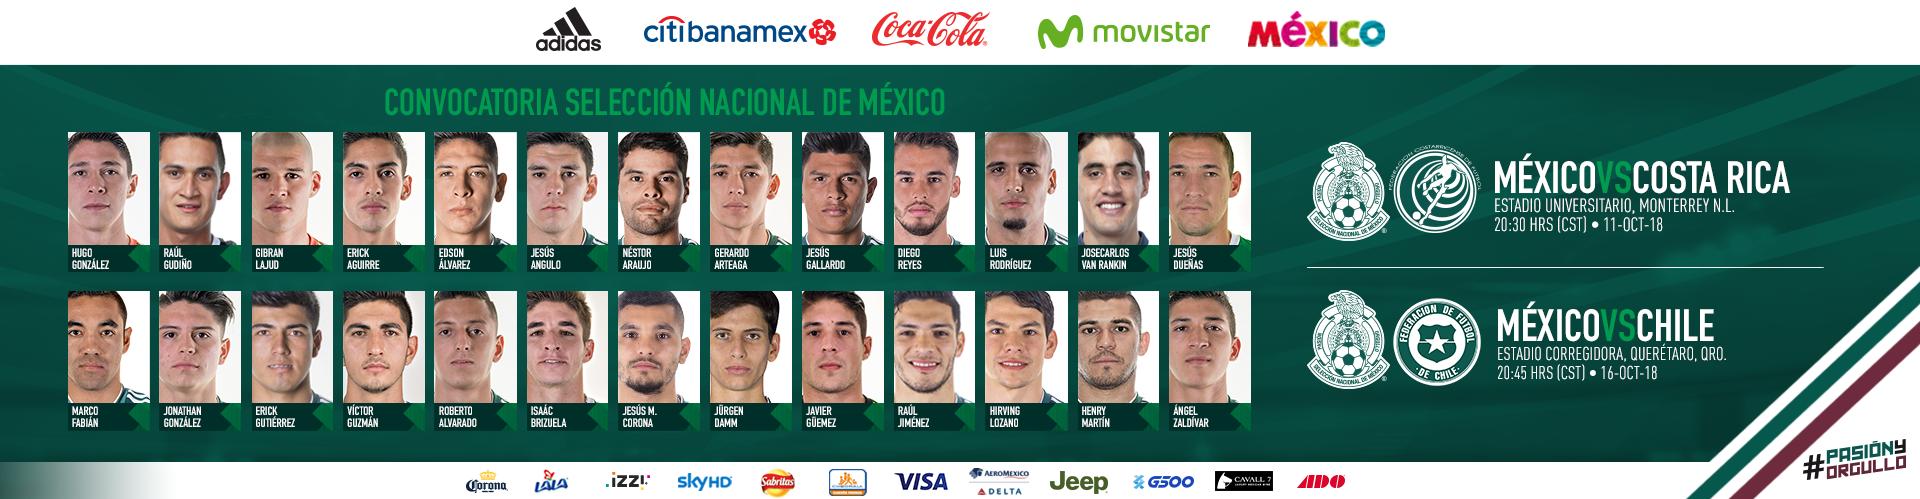 Convocatoria de la Selección Nacional de México fcba8603a6273